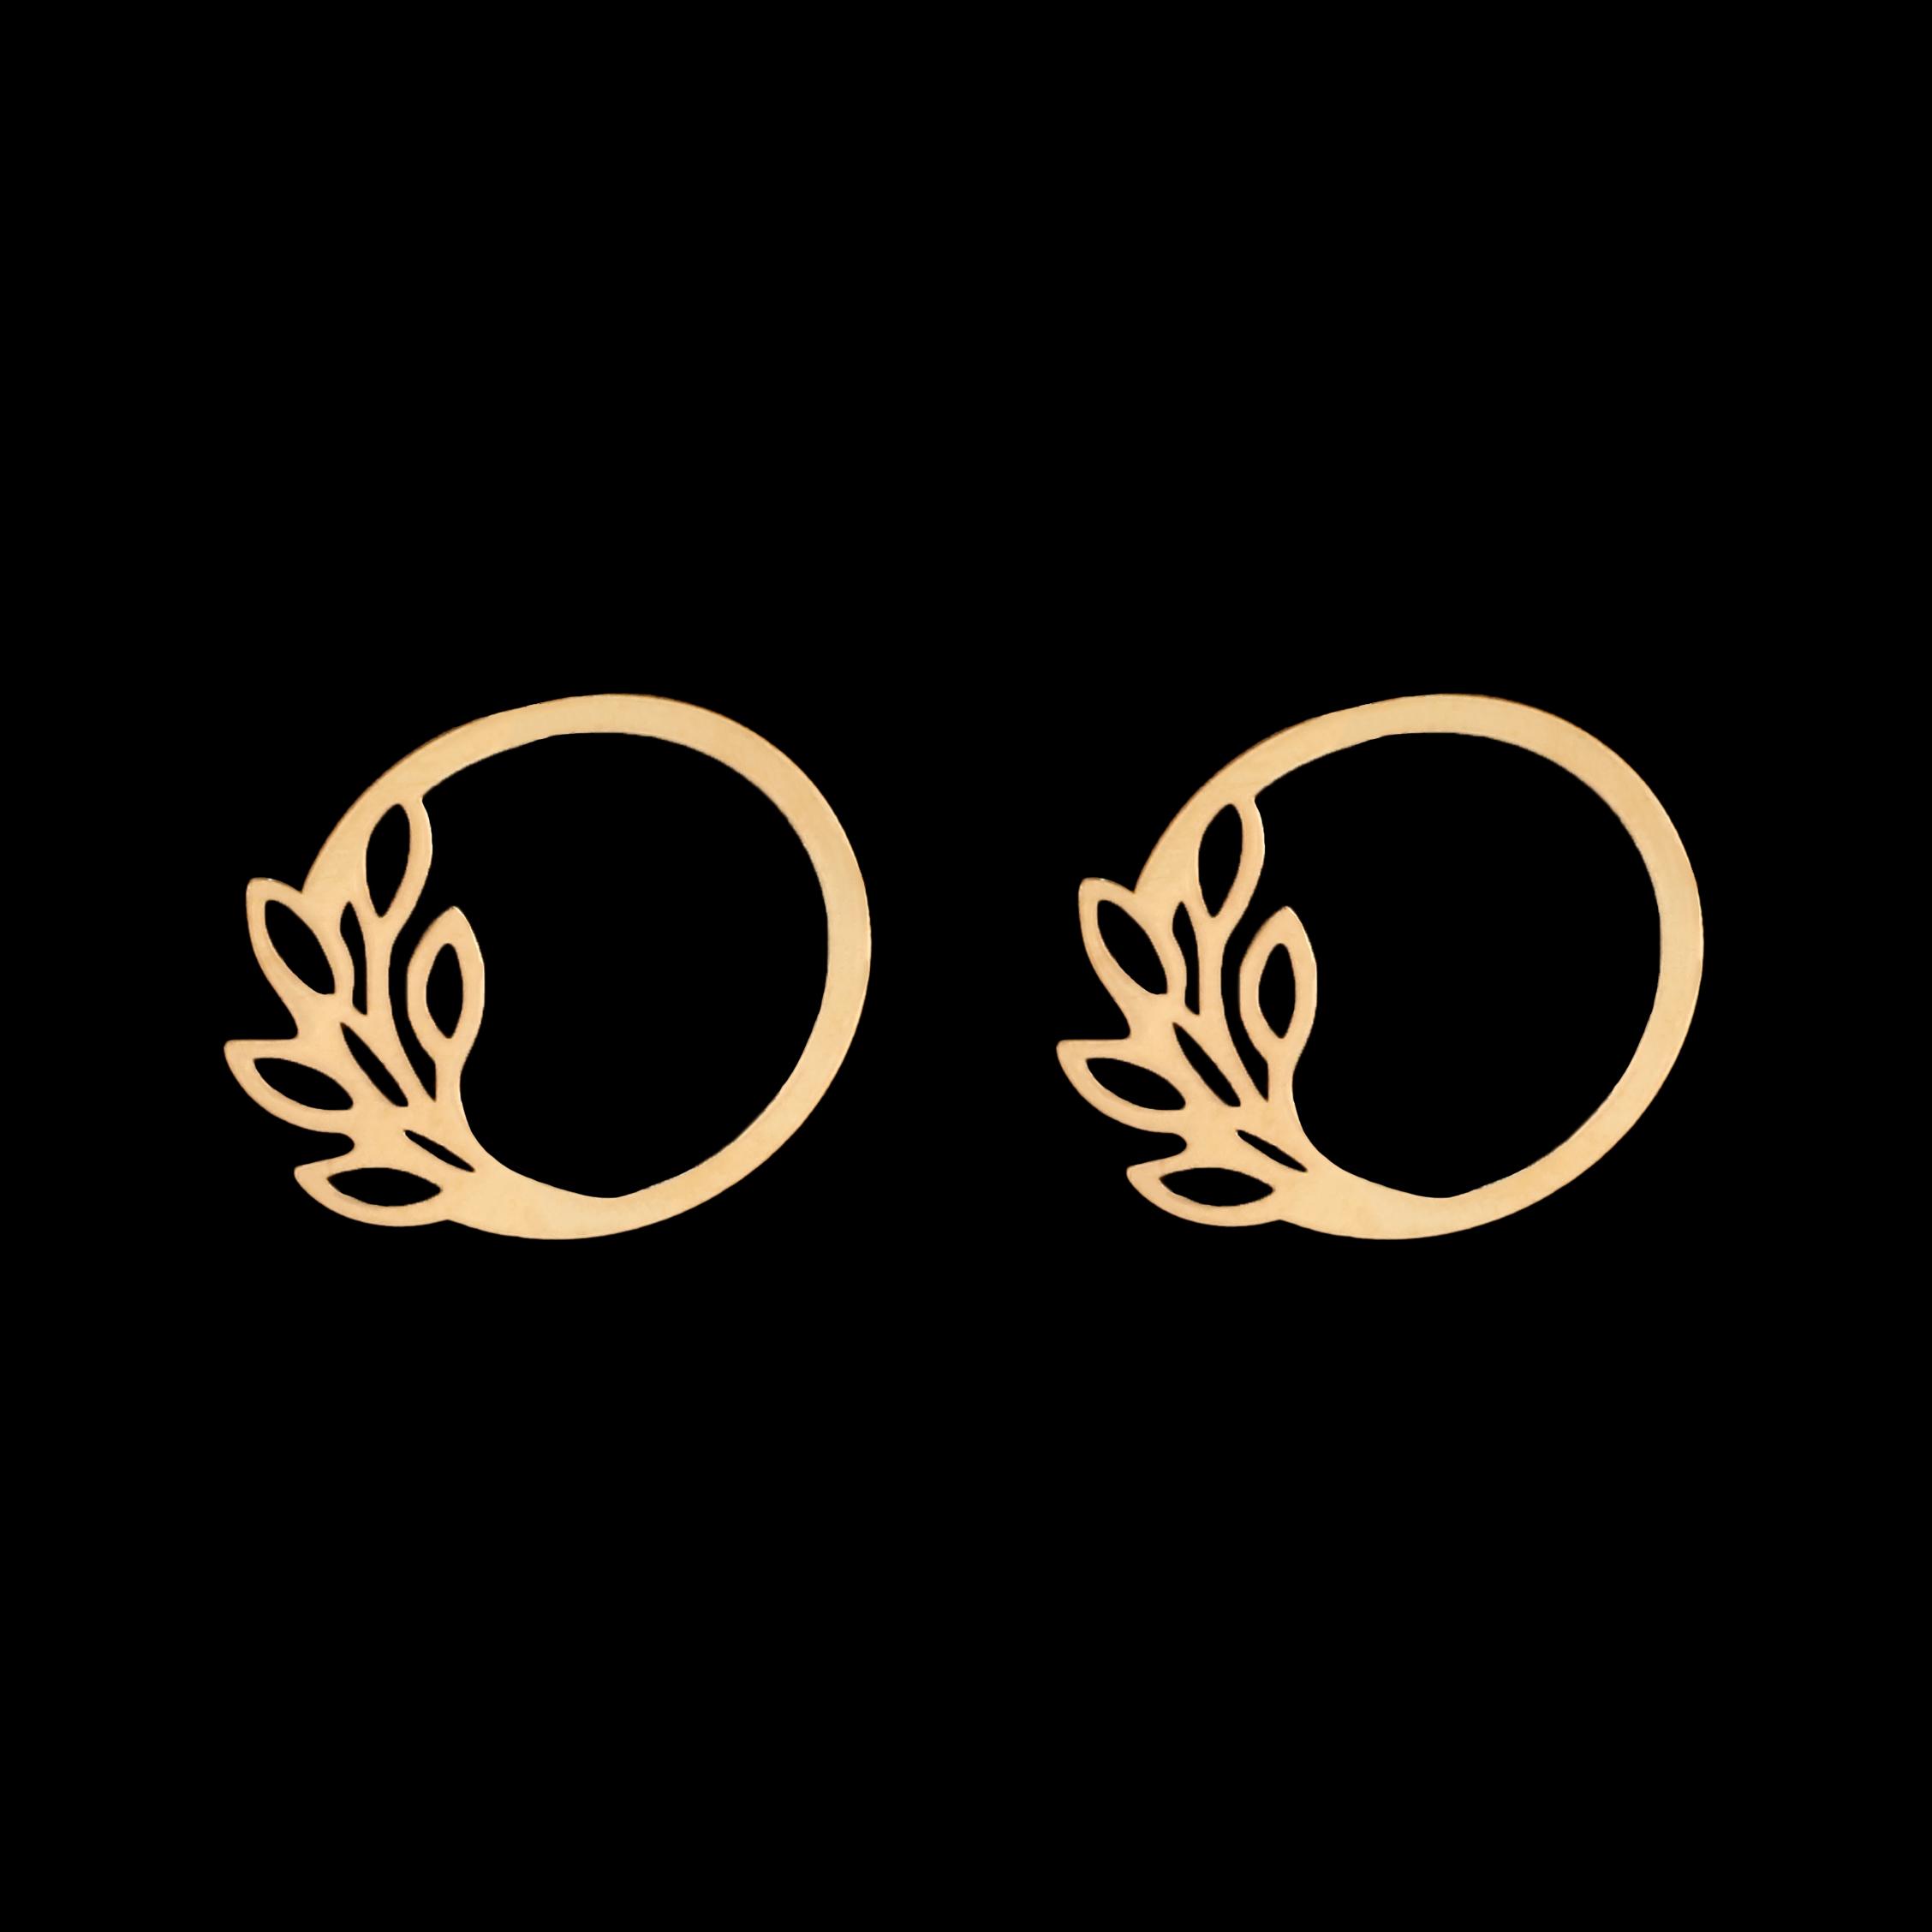 گوشواره طلا 18 عیار زنانه آمانژ مدل گل کد D10222